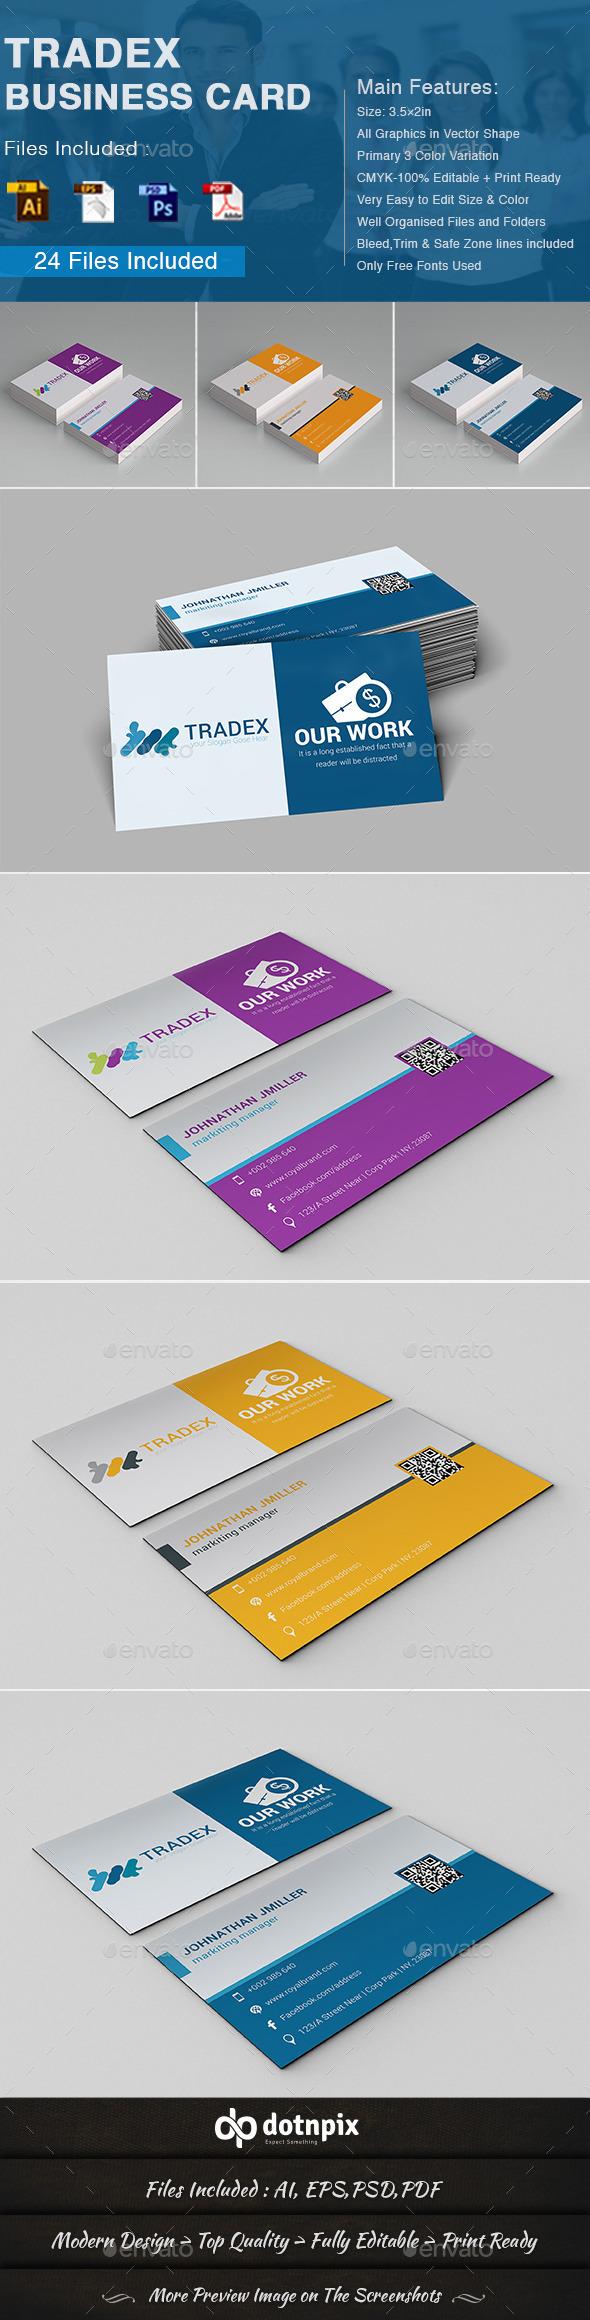 GraphicRiver Tradex Business Card 10863934